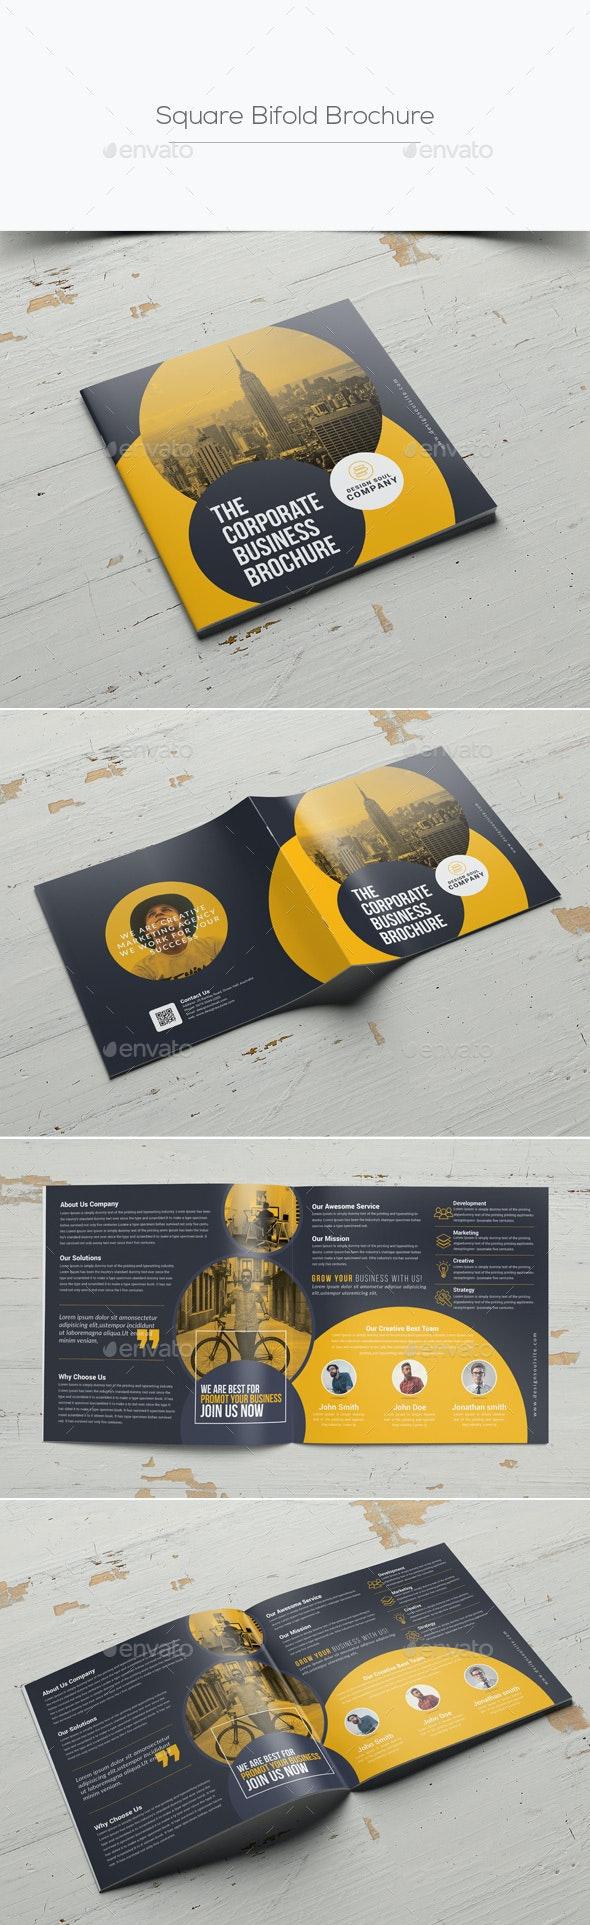 Square Bifold Brochure - Corporate Brochures